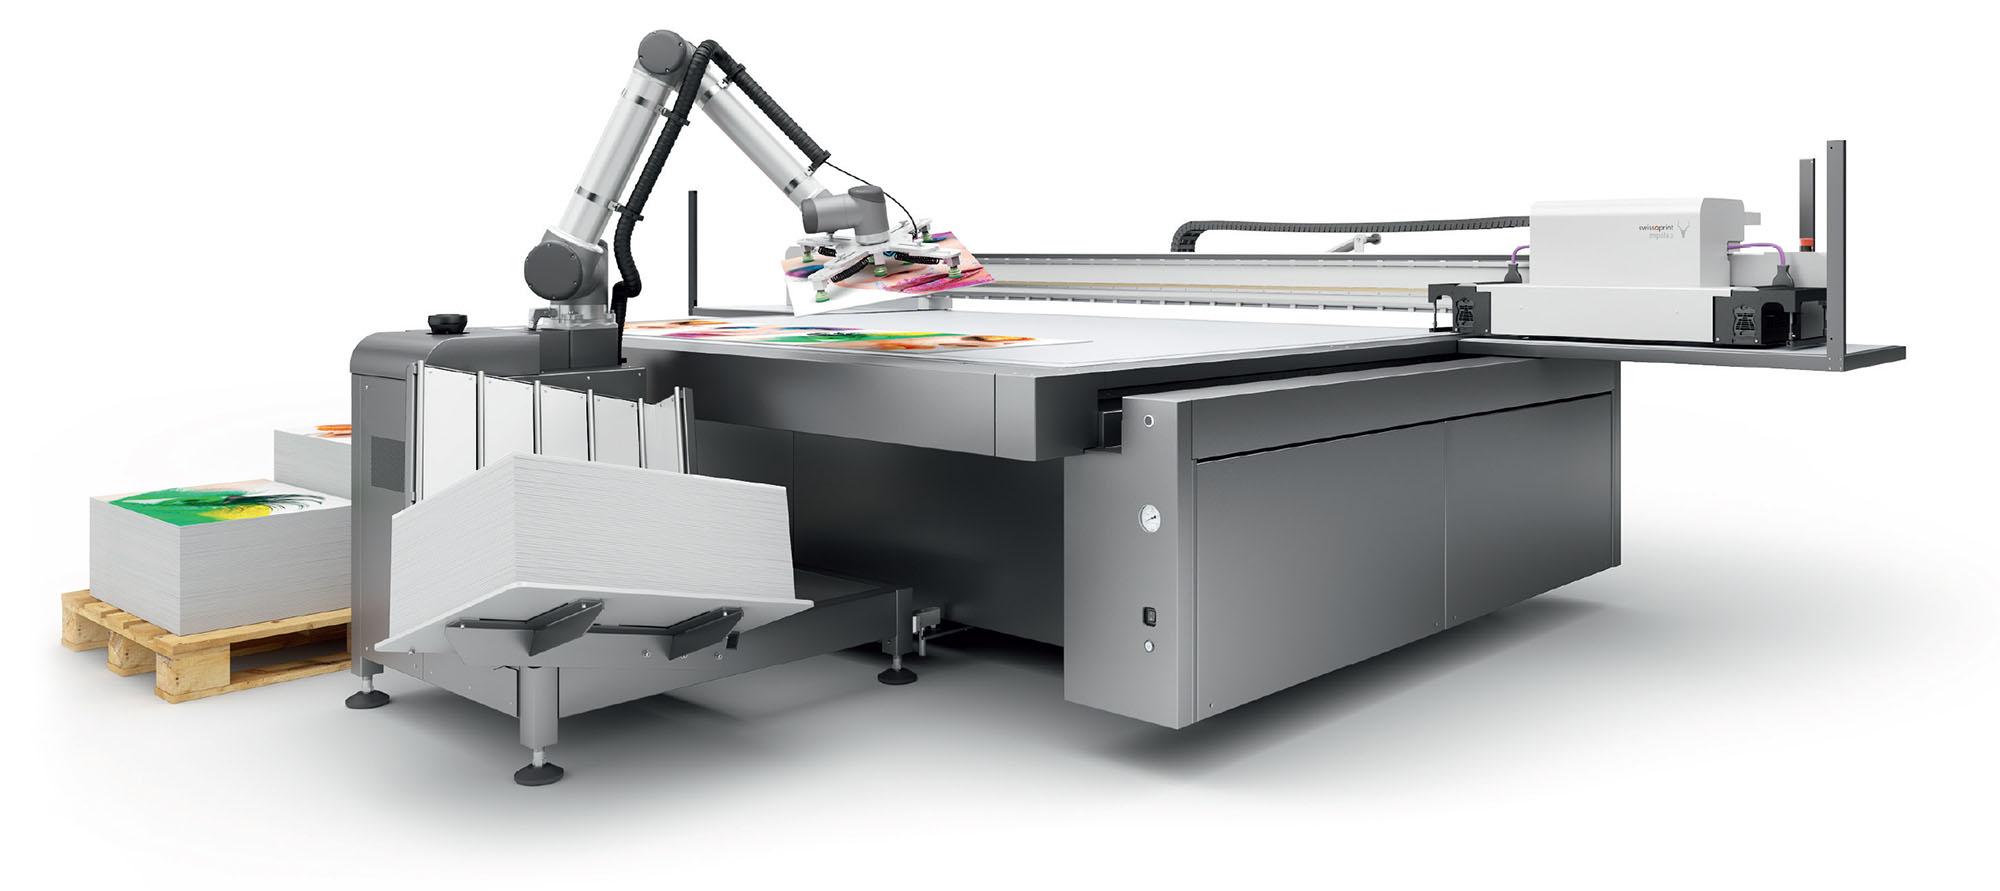 stampa uv pannelli espositivi